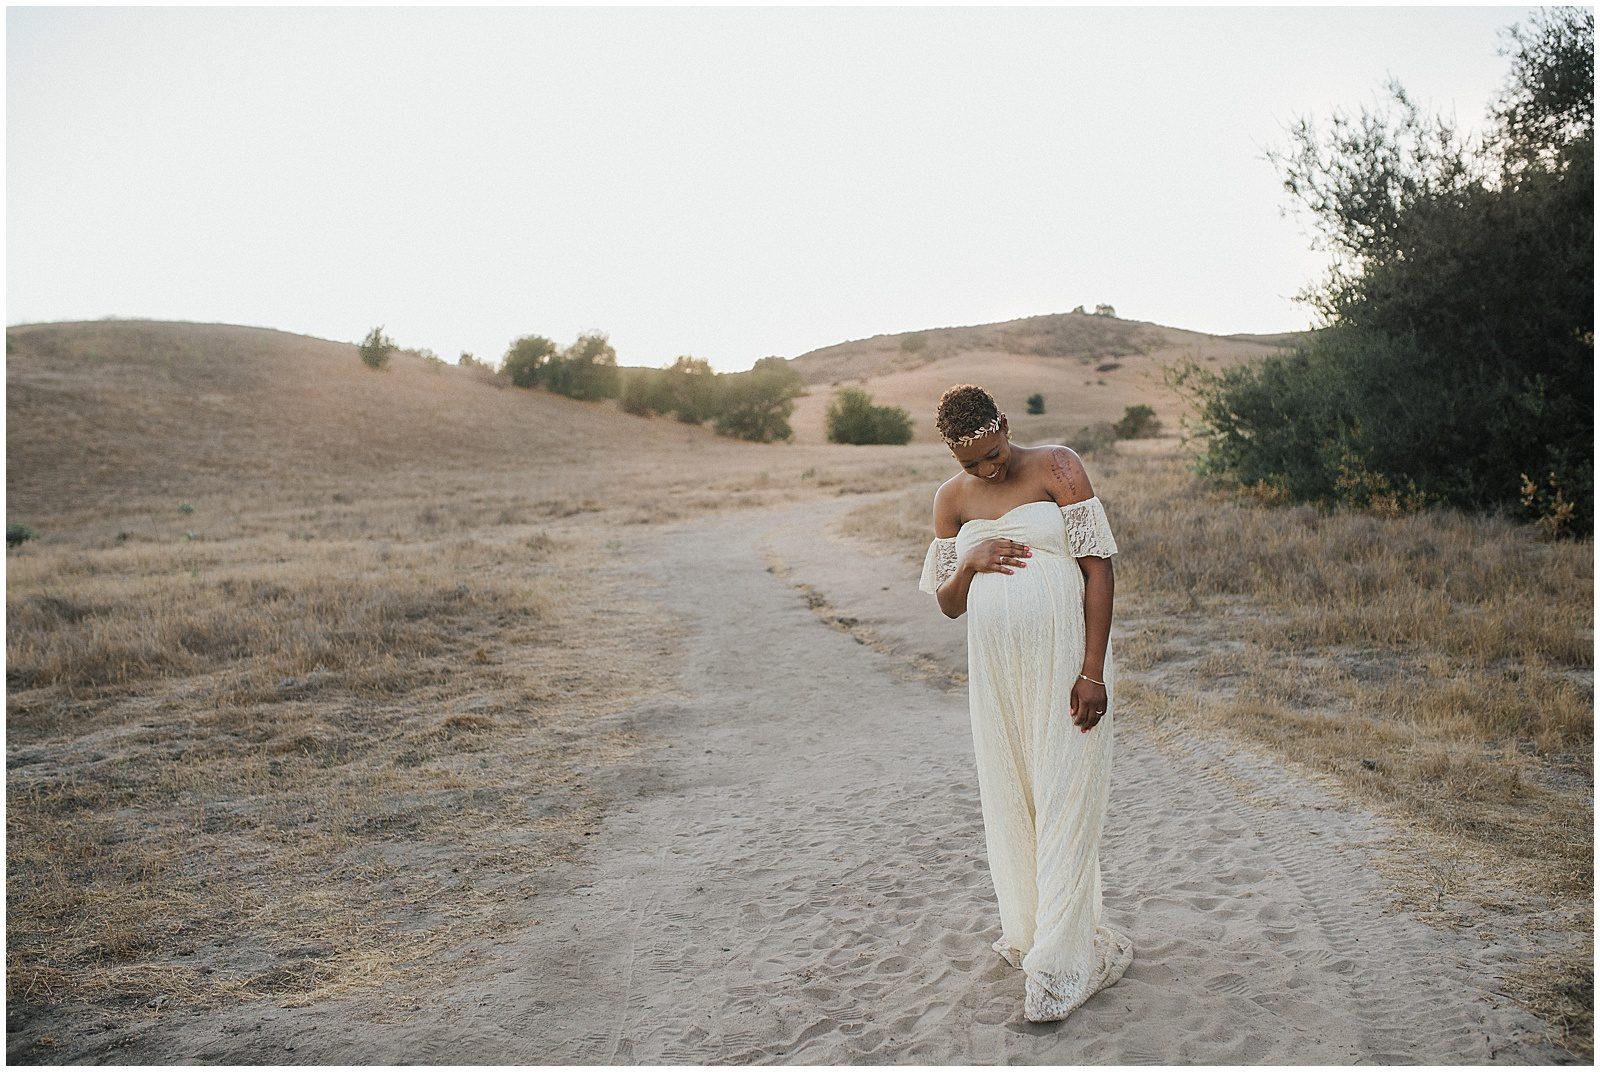 Orange County Maternity Photographer Sonja Hammad Photography 0184